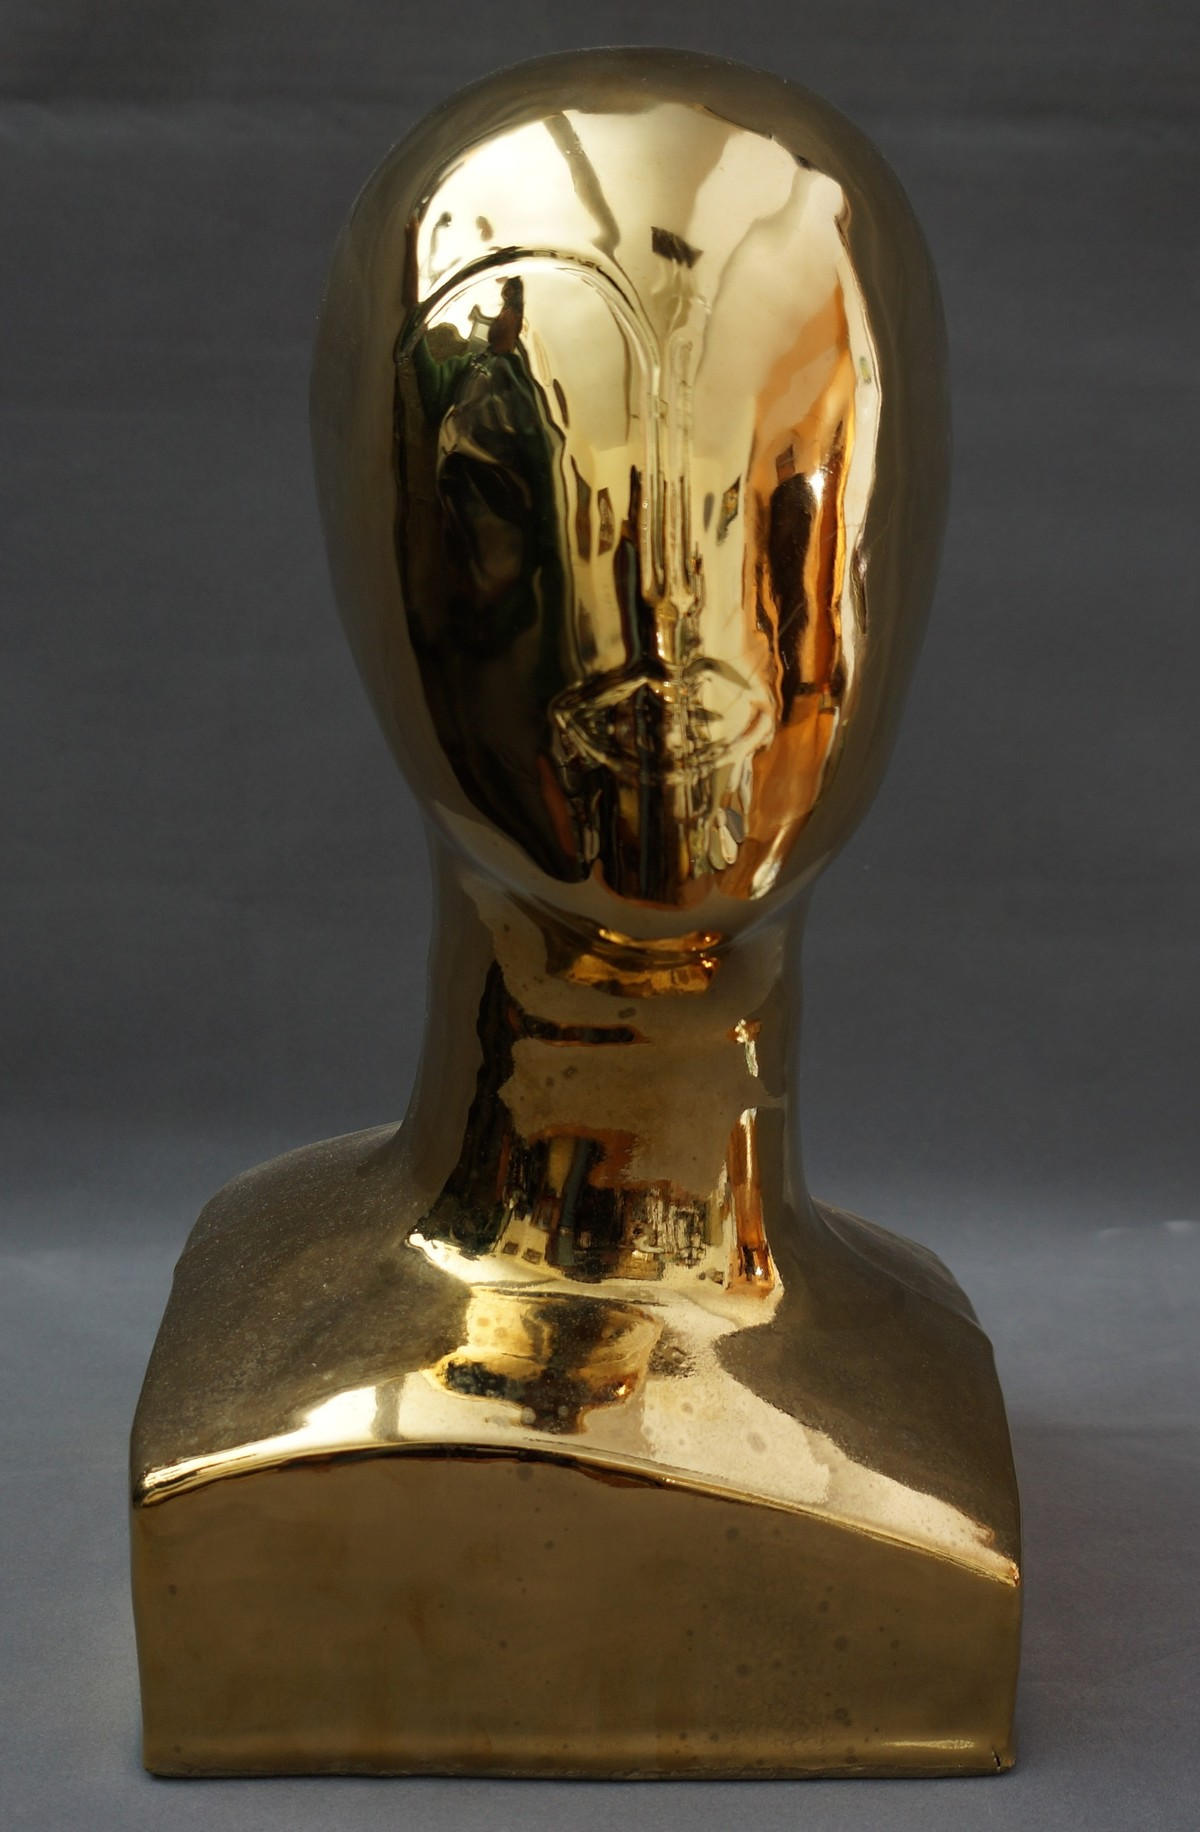 TIMELESS 1 by Usha Garodia, Art Deco Sculpture | 3D, Ceramic, Black color